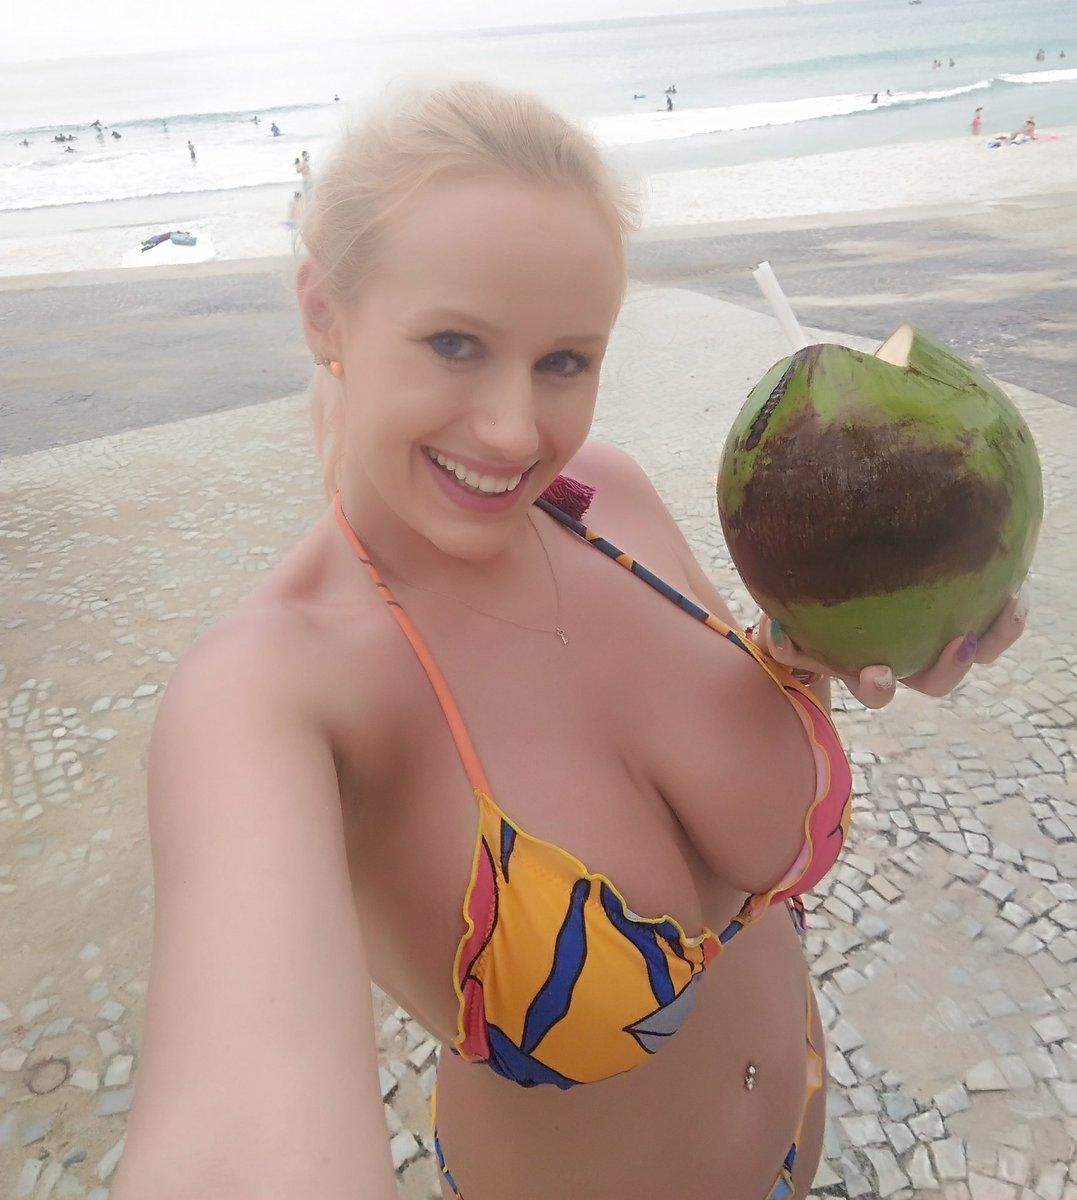 2 pic. Joung coconut 😍😍😍😍😍😍💟💟💟🌴🌴🌴 Wjopjna0Ky